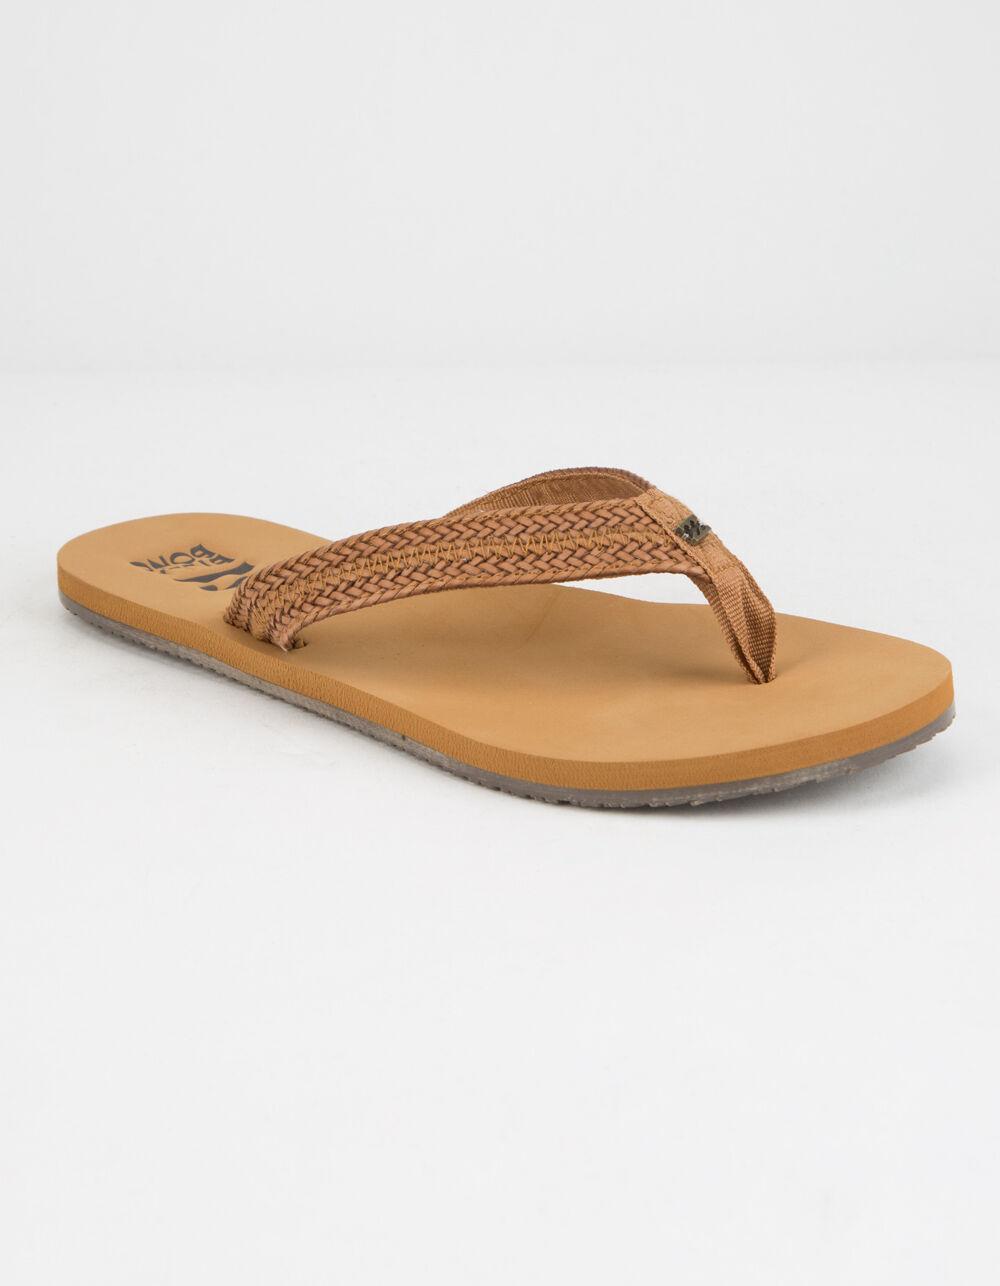 BILLABONG Kai Tan Sandals